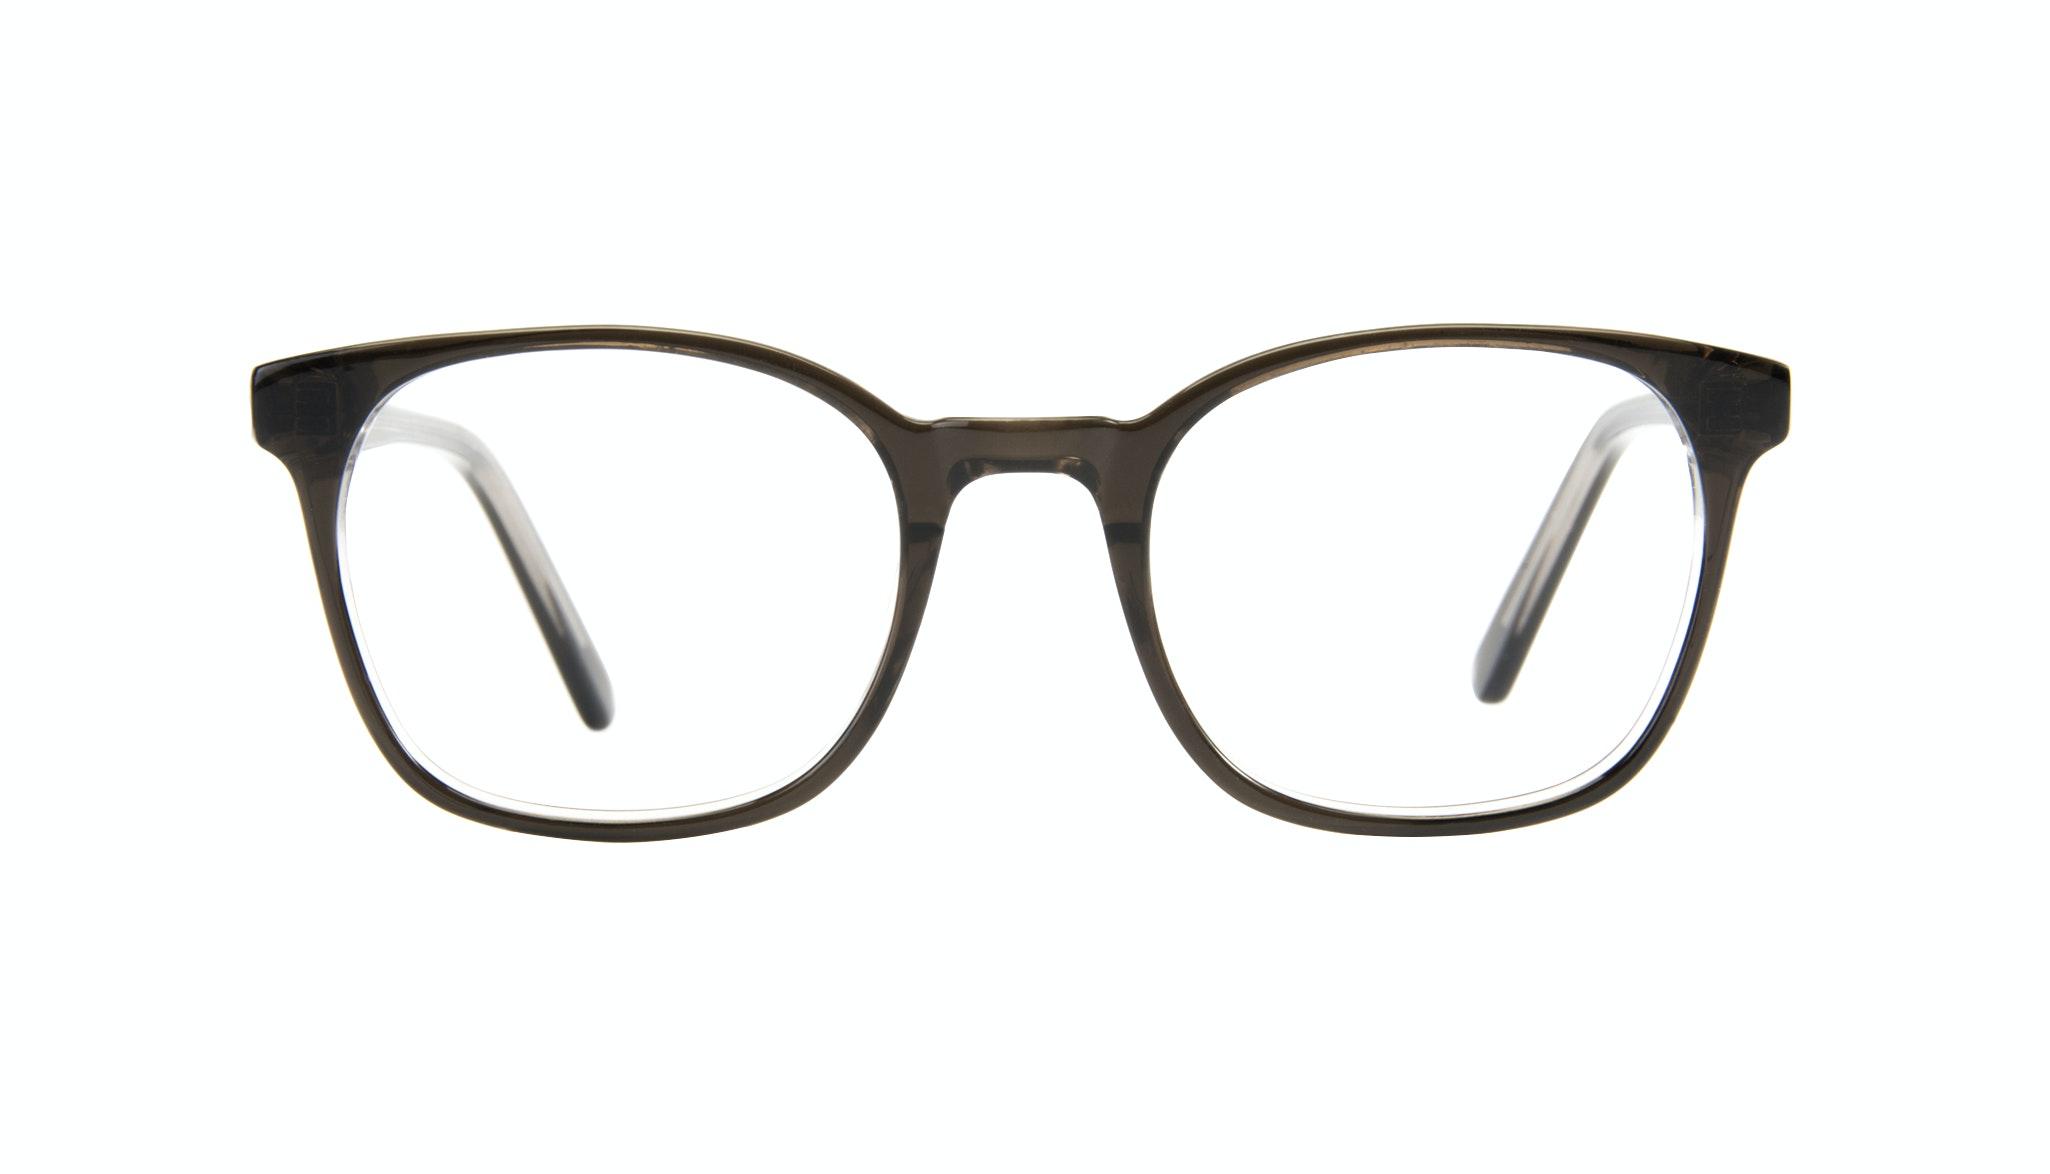 Affordable Fashion Glasses Rectangle Square Eyeglasses Men Peak Black Ice